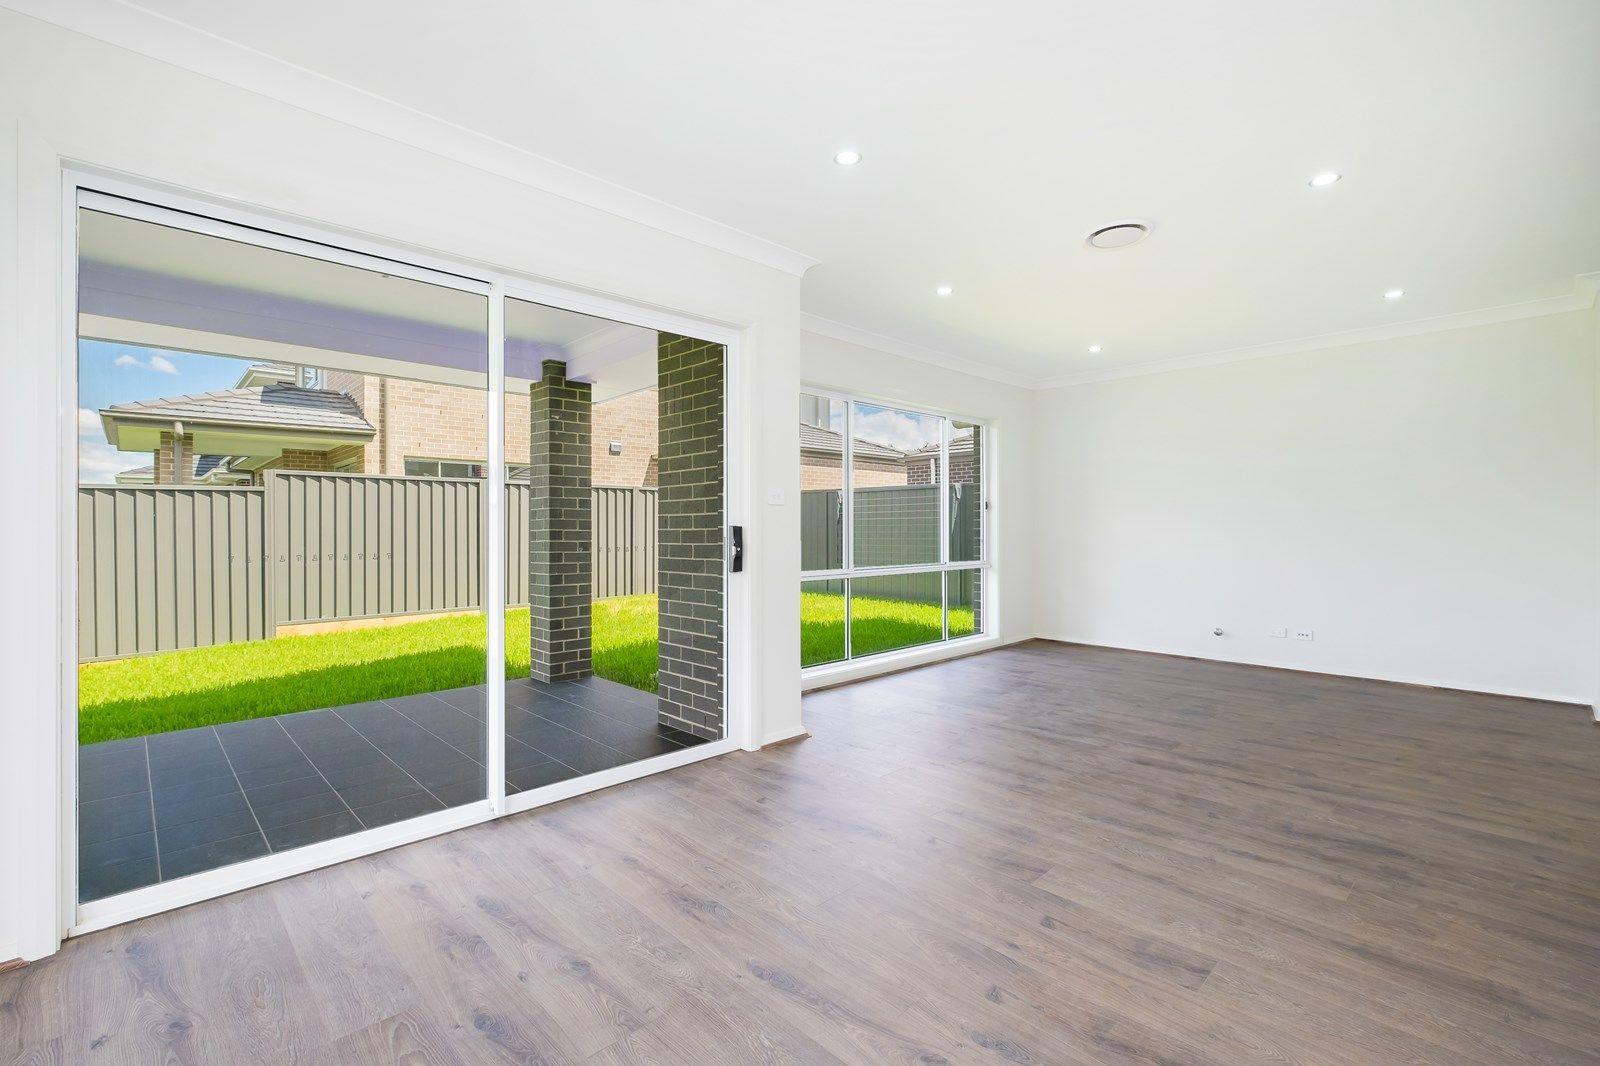 Lot 43 Brinsley Ave, Schofields NSW 2762, Image 1